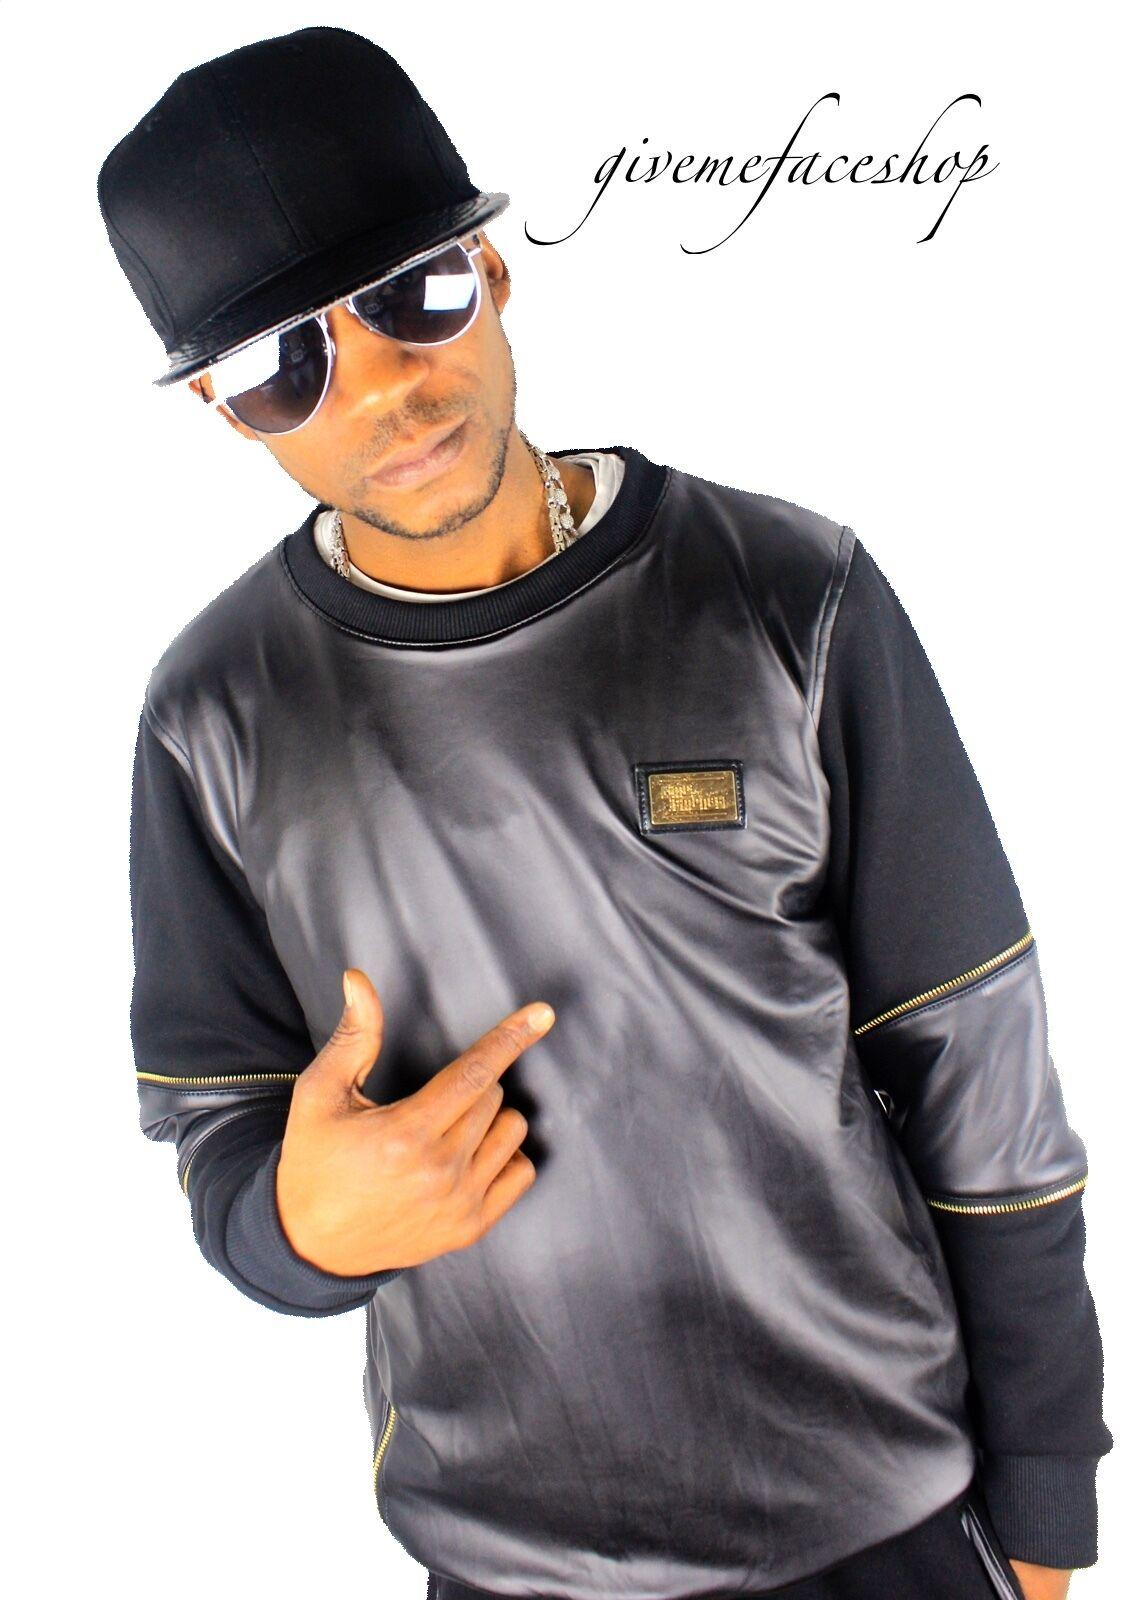 Time is Money G faux Leder pu sweatshirt club-star jumper hip hop, 3xl-6xl